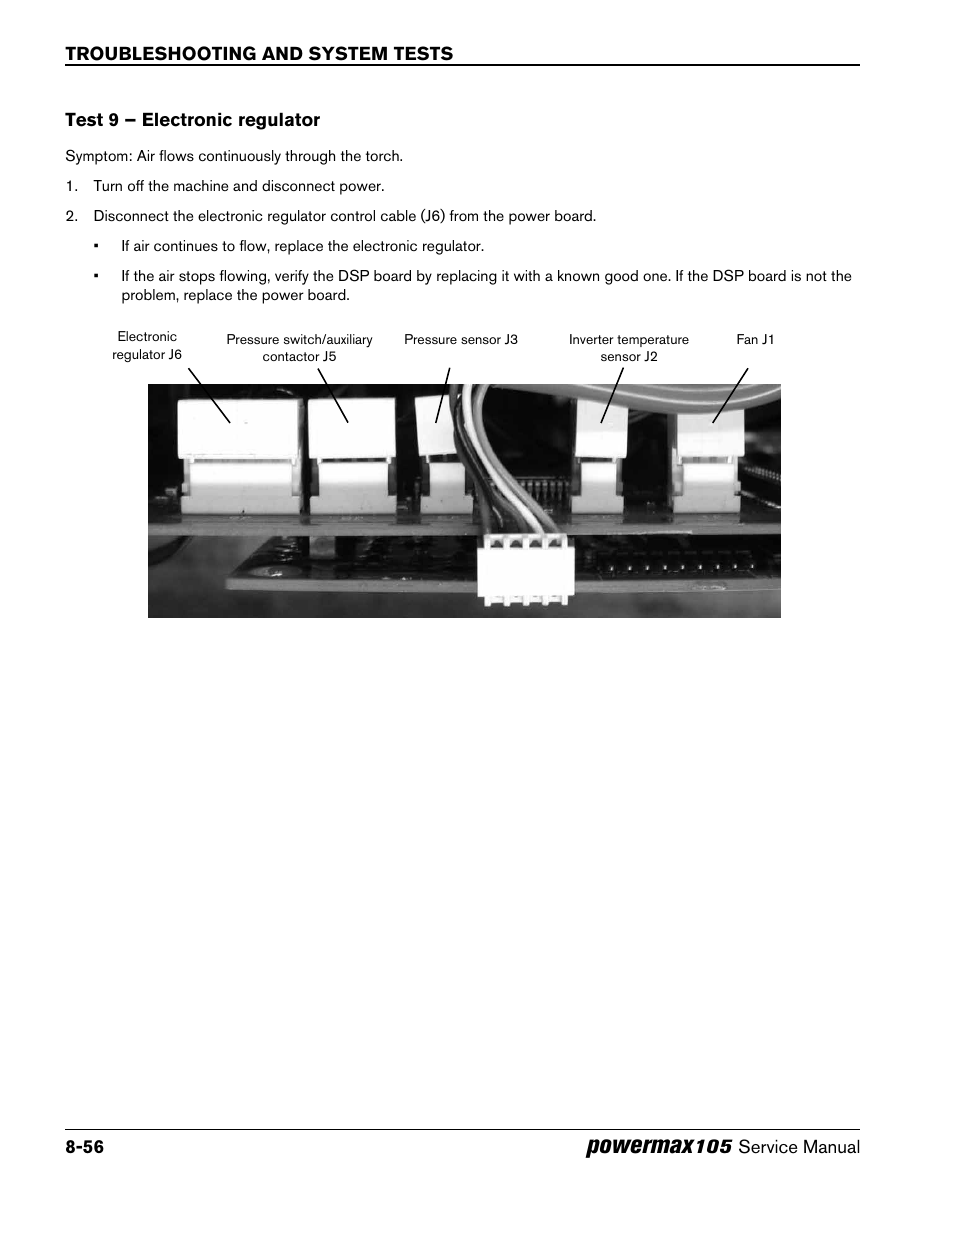 Test 9 – electronic regulator, Test 9 – electronic regulator -56